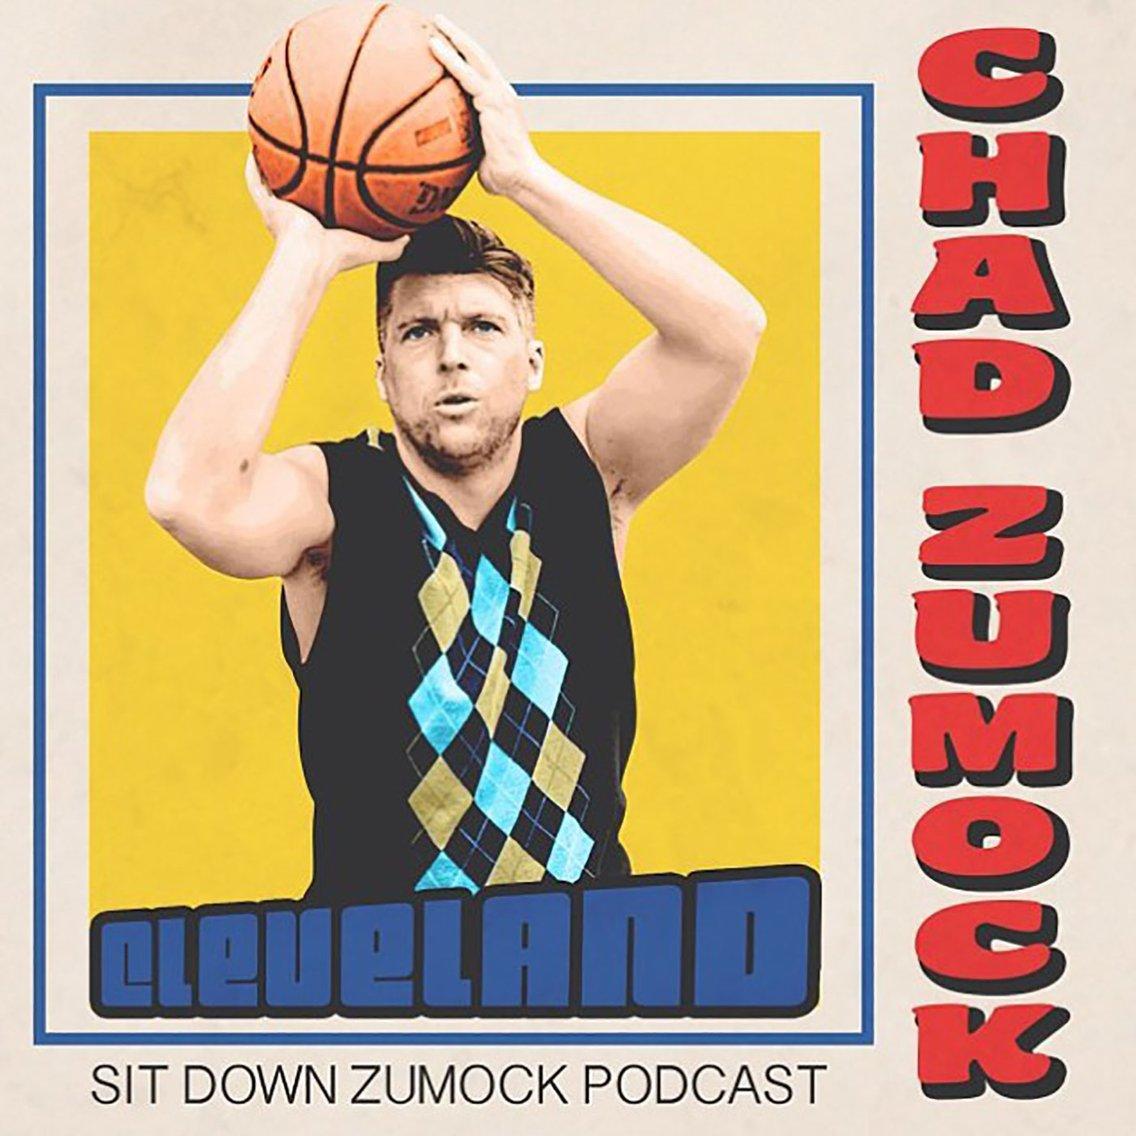 Sit Down Zumock! with Chad Zumock - immagine di copertina